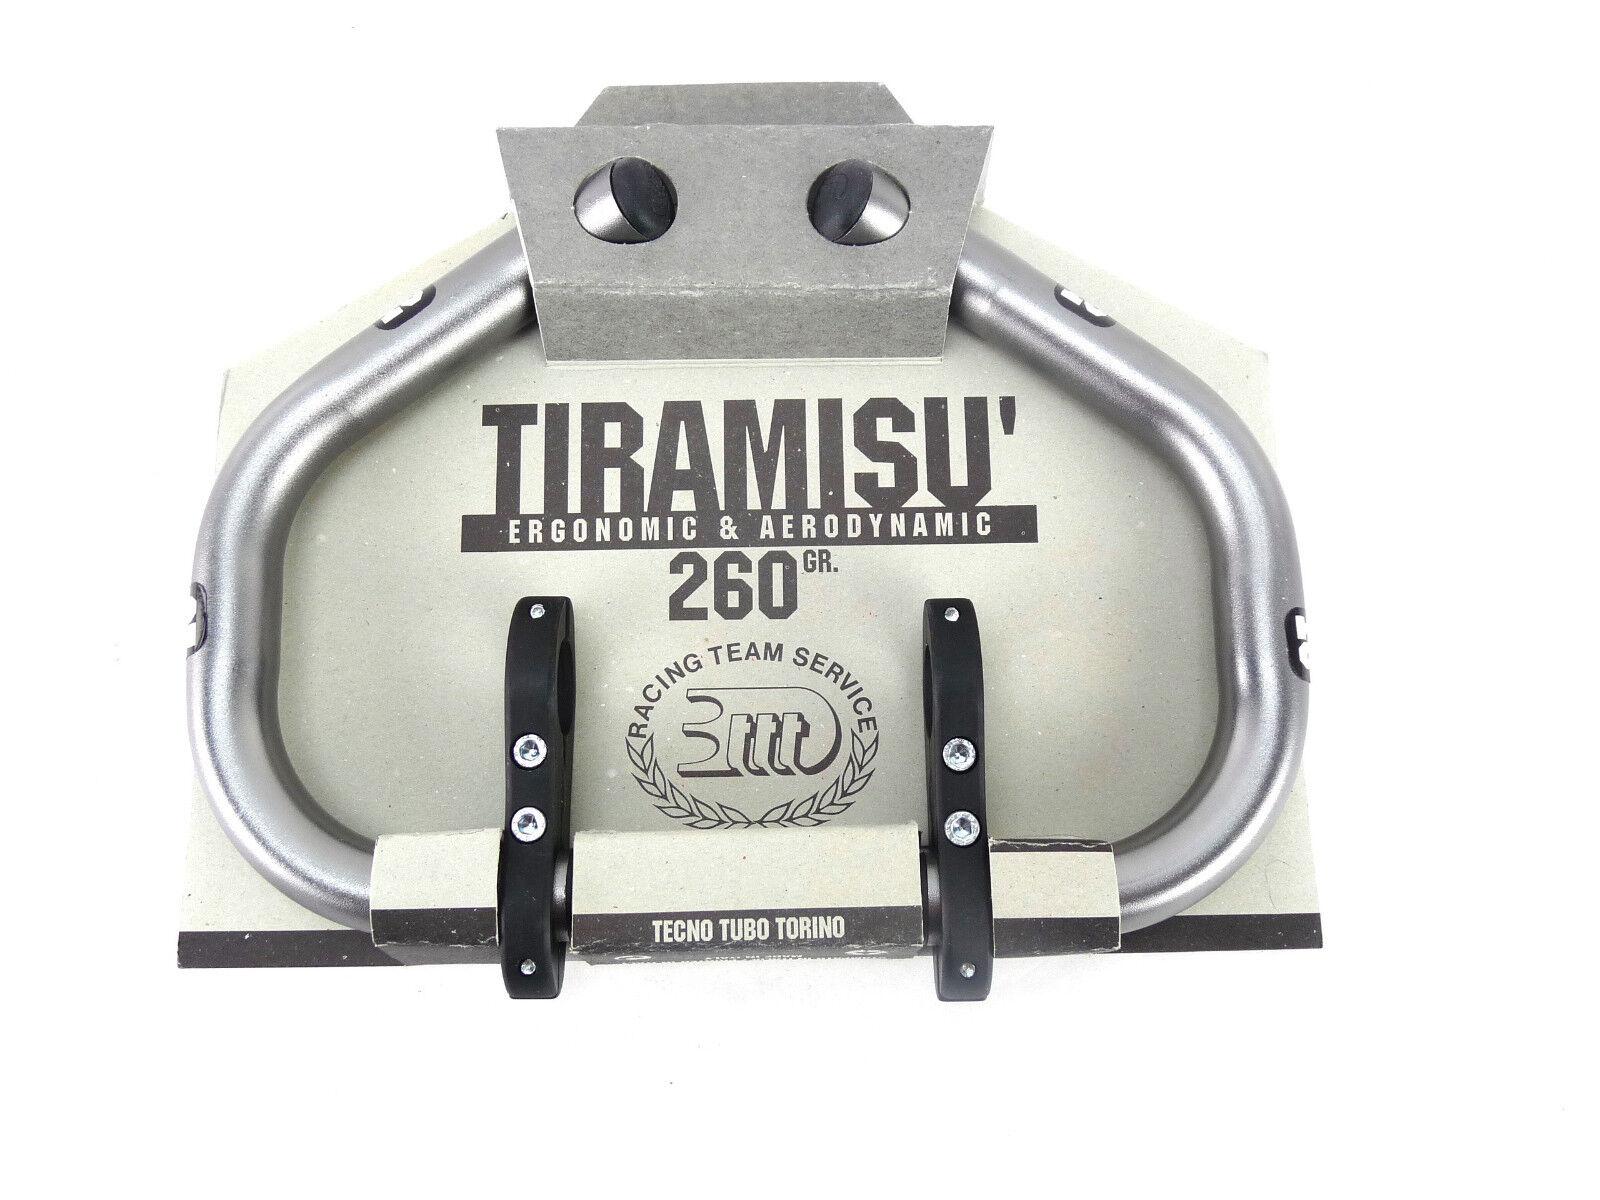 3ttt Handlebar Extensions Tiramisu For Touring TTT Vintage Bike  3T Dark NOS  luxury brand